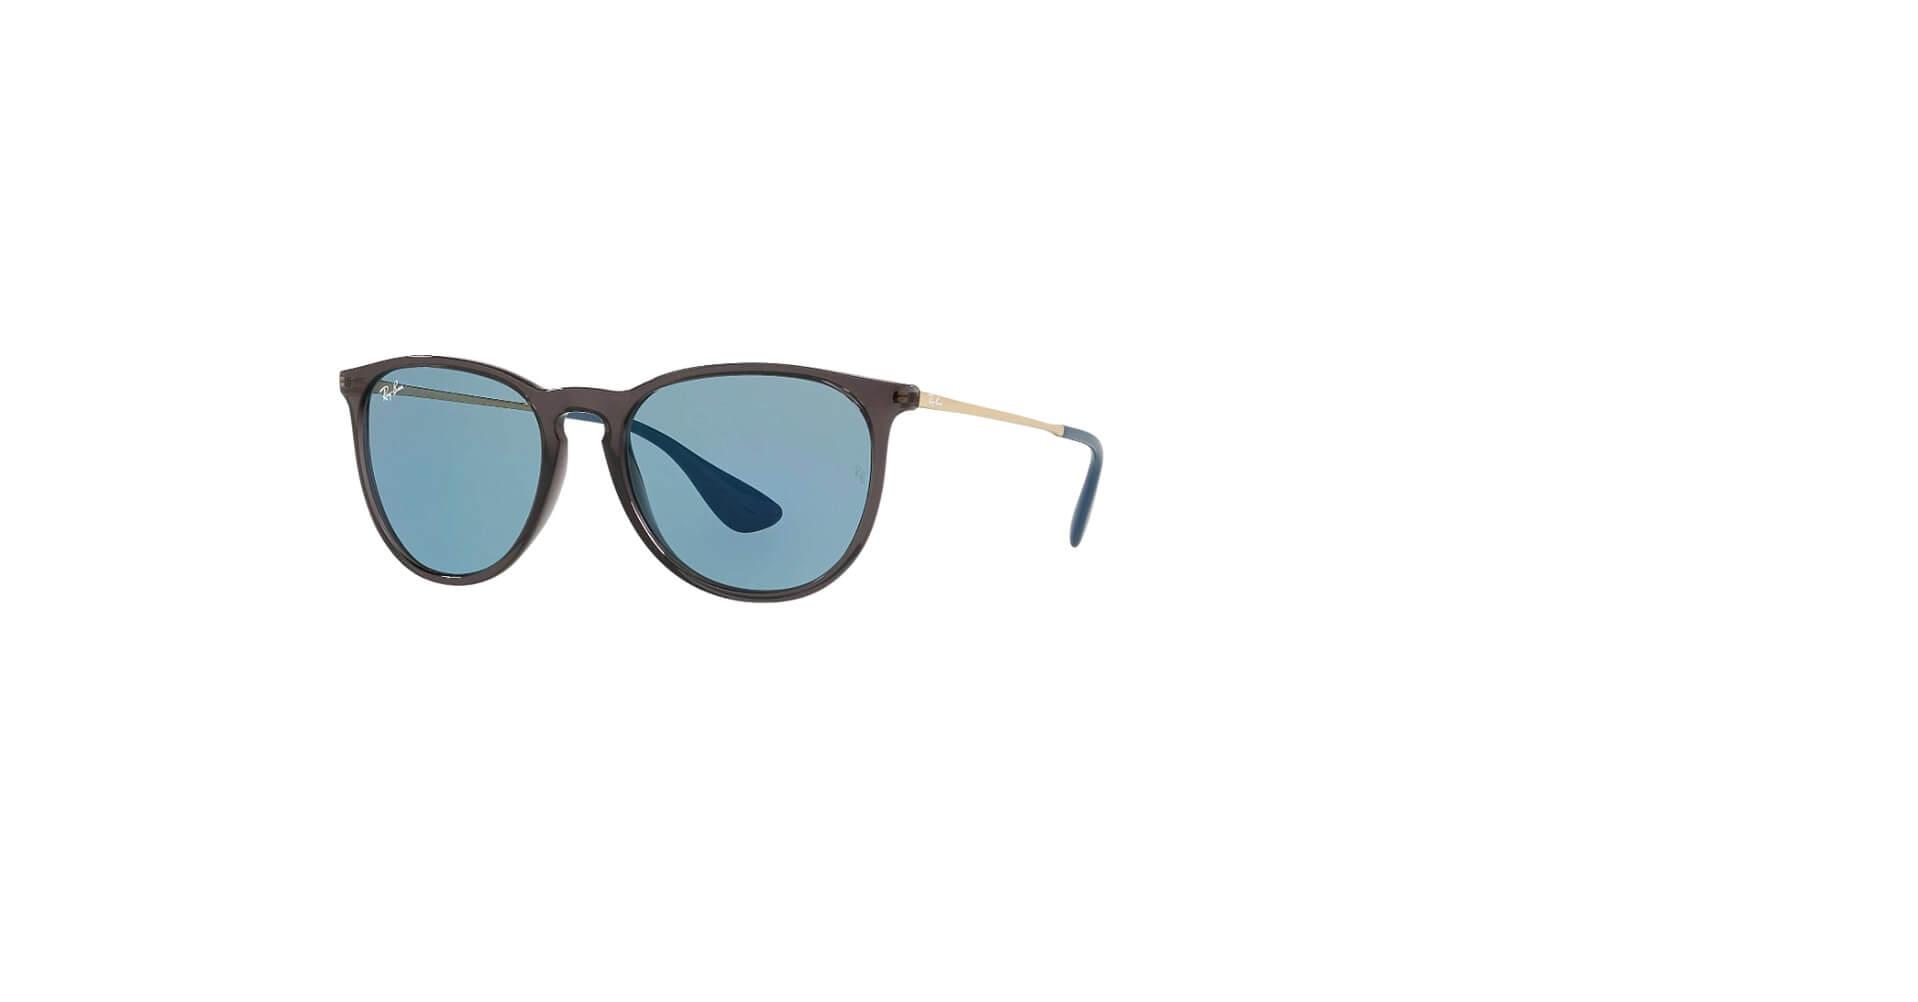 erika-sunglasses by ray-ban